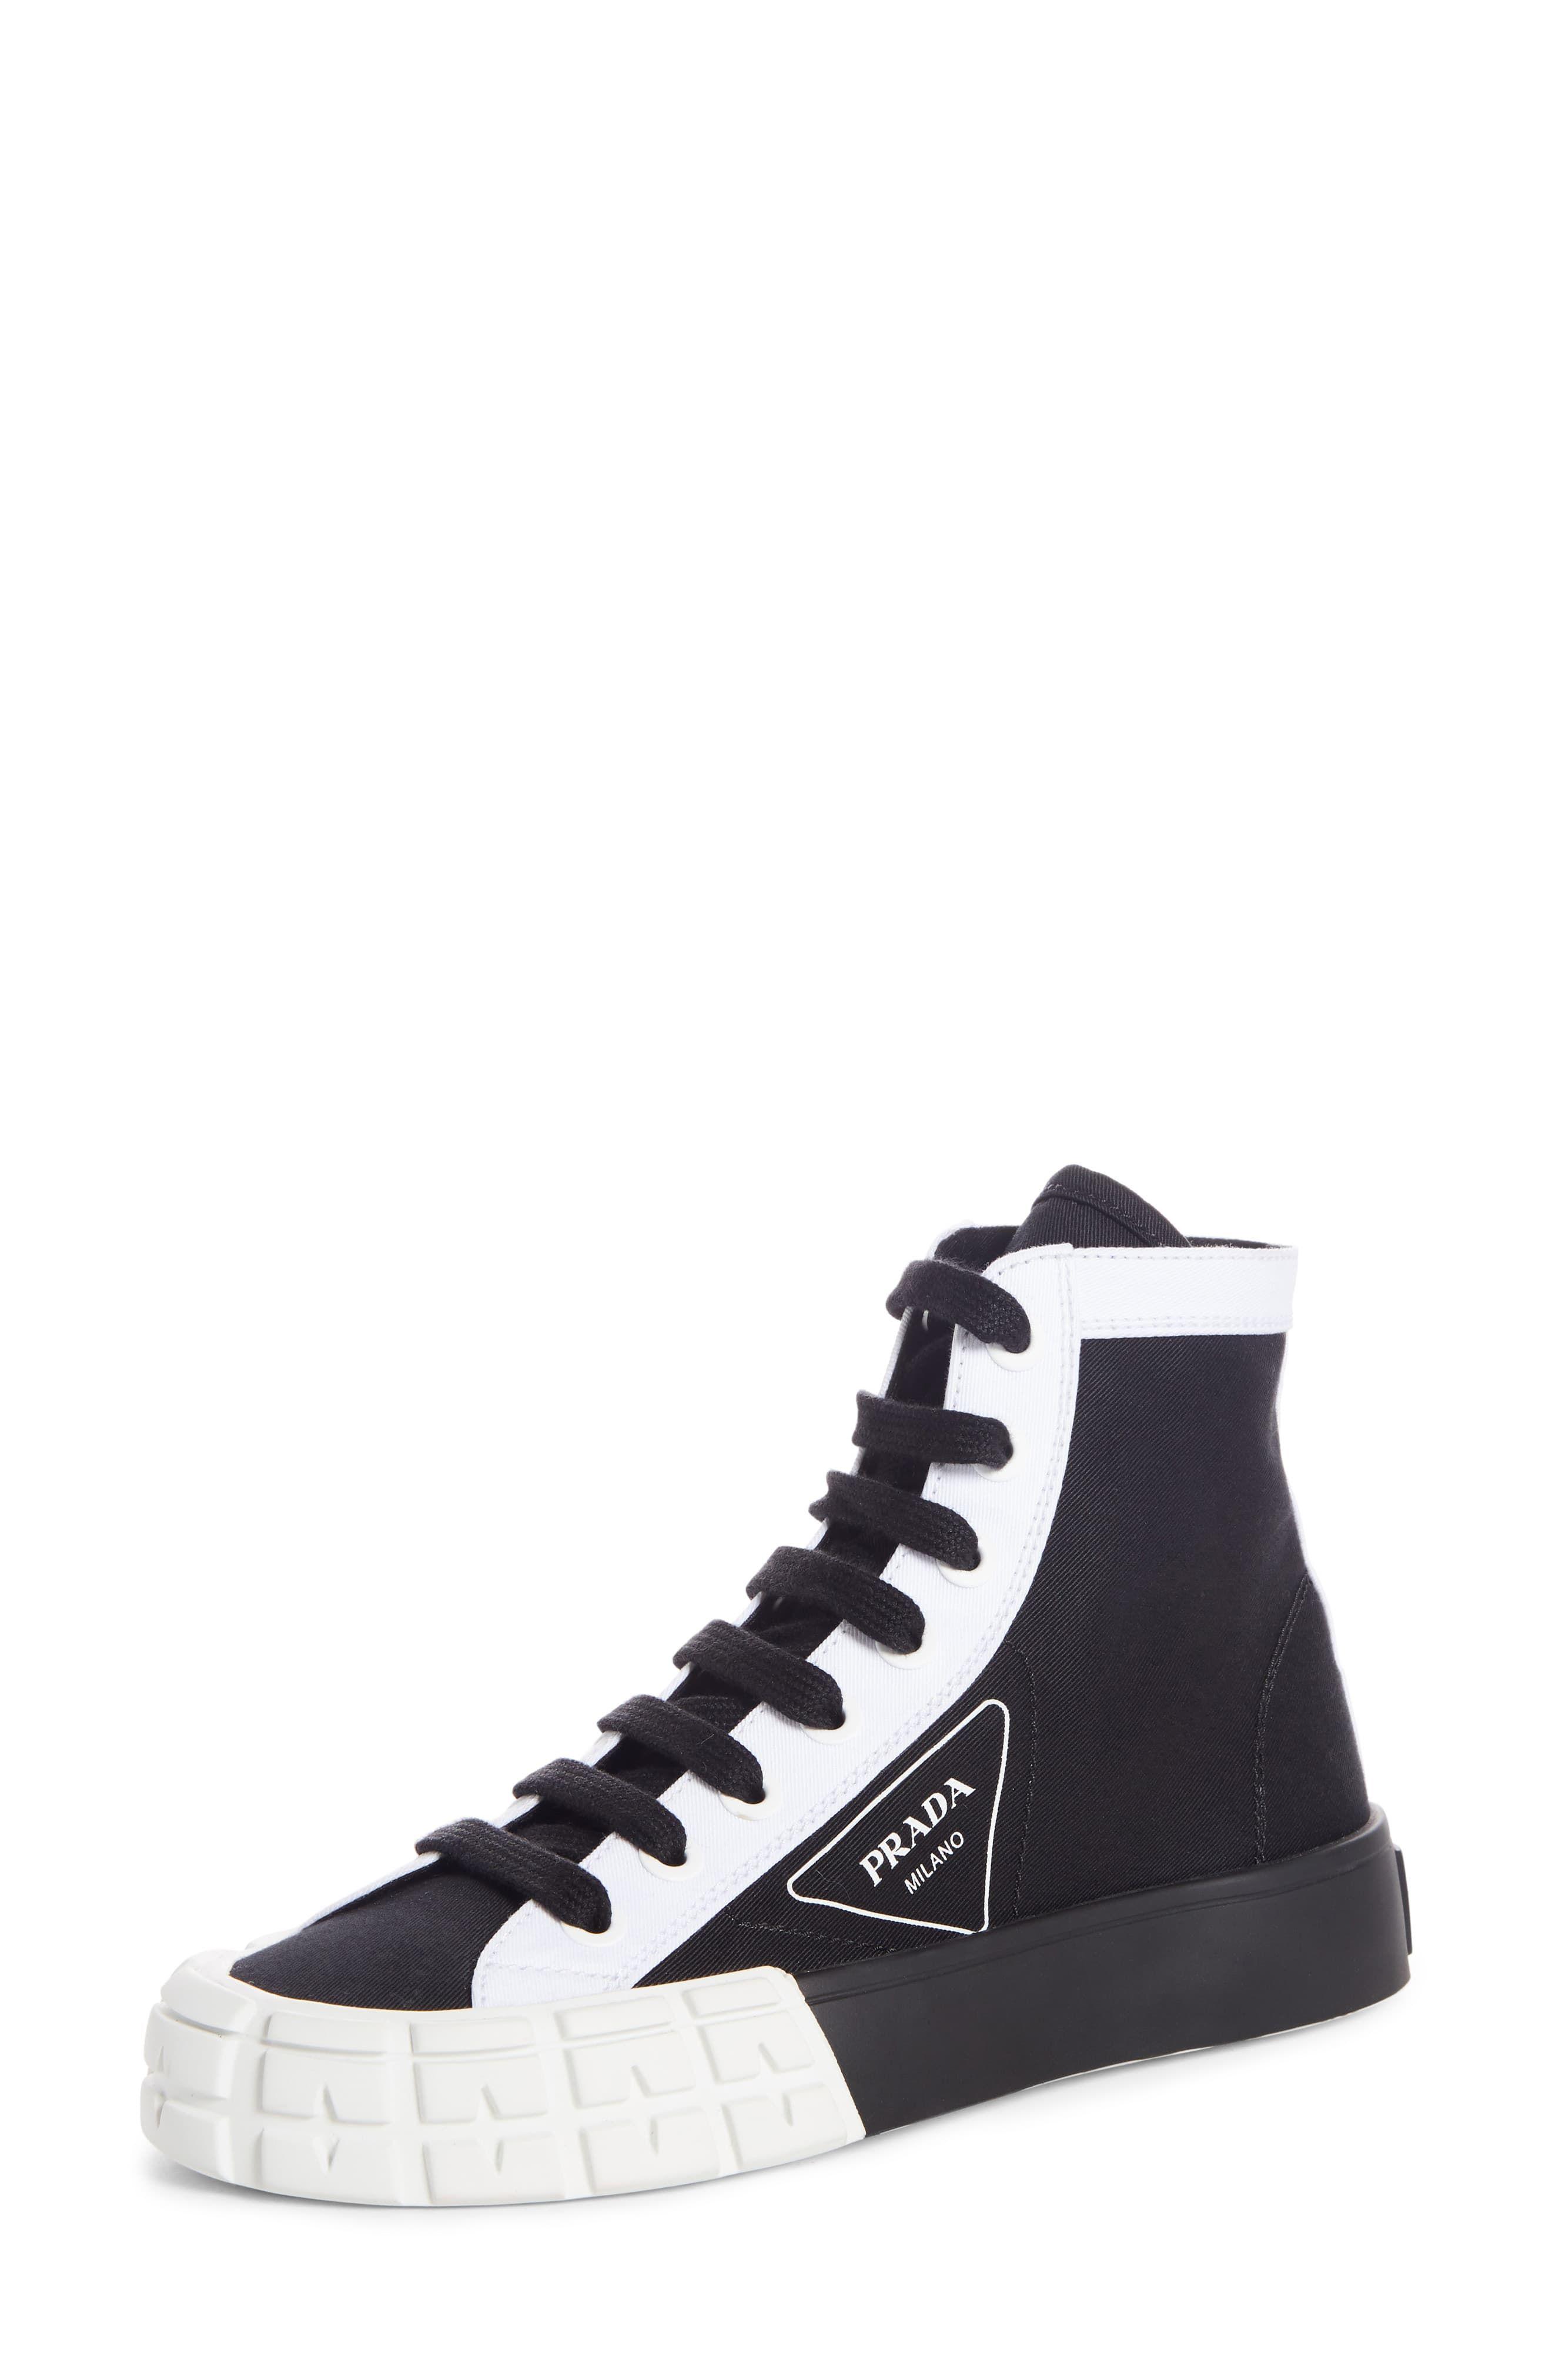 Women S Prada Logo High Top Sneaker Size 8us 38eu Black In